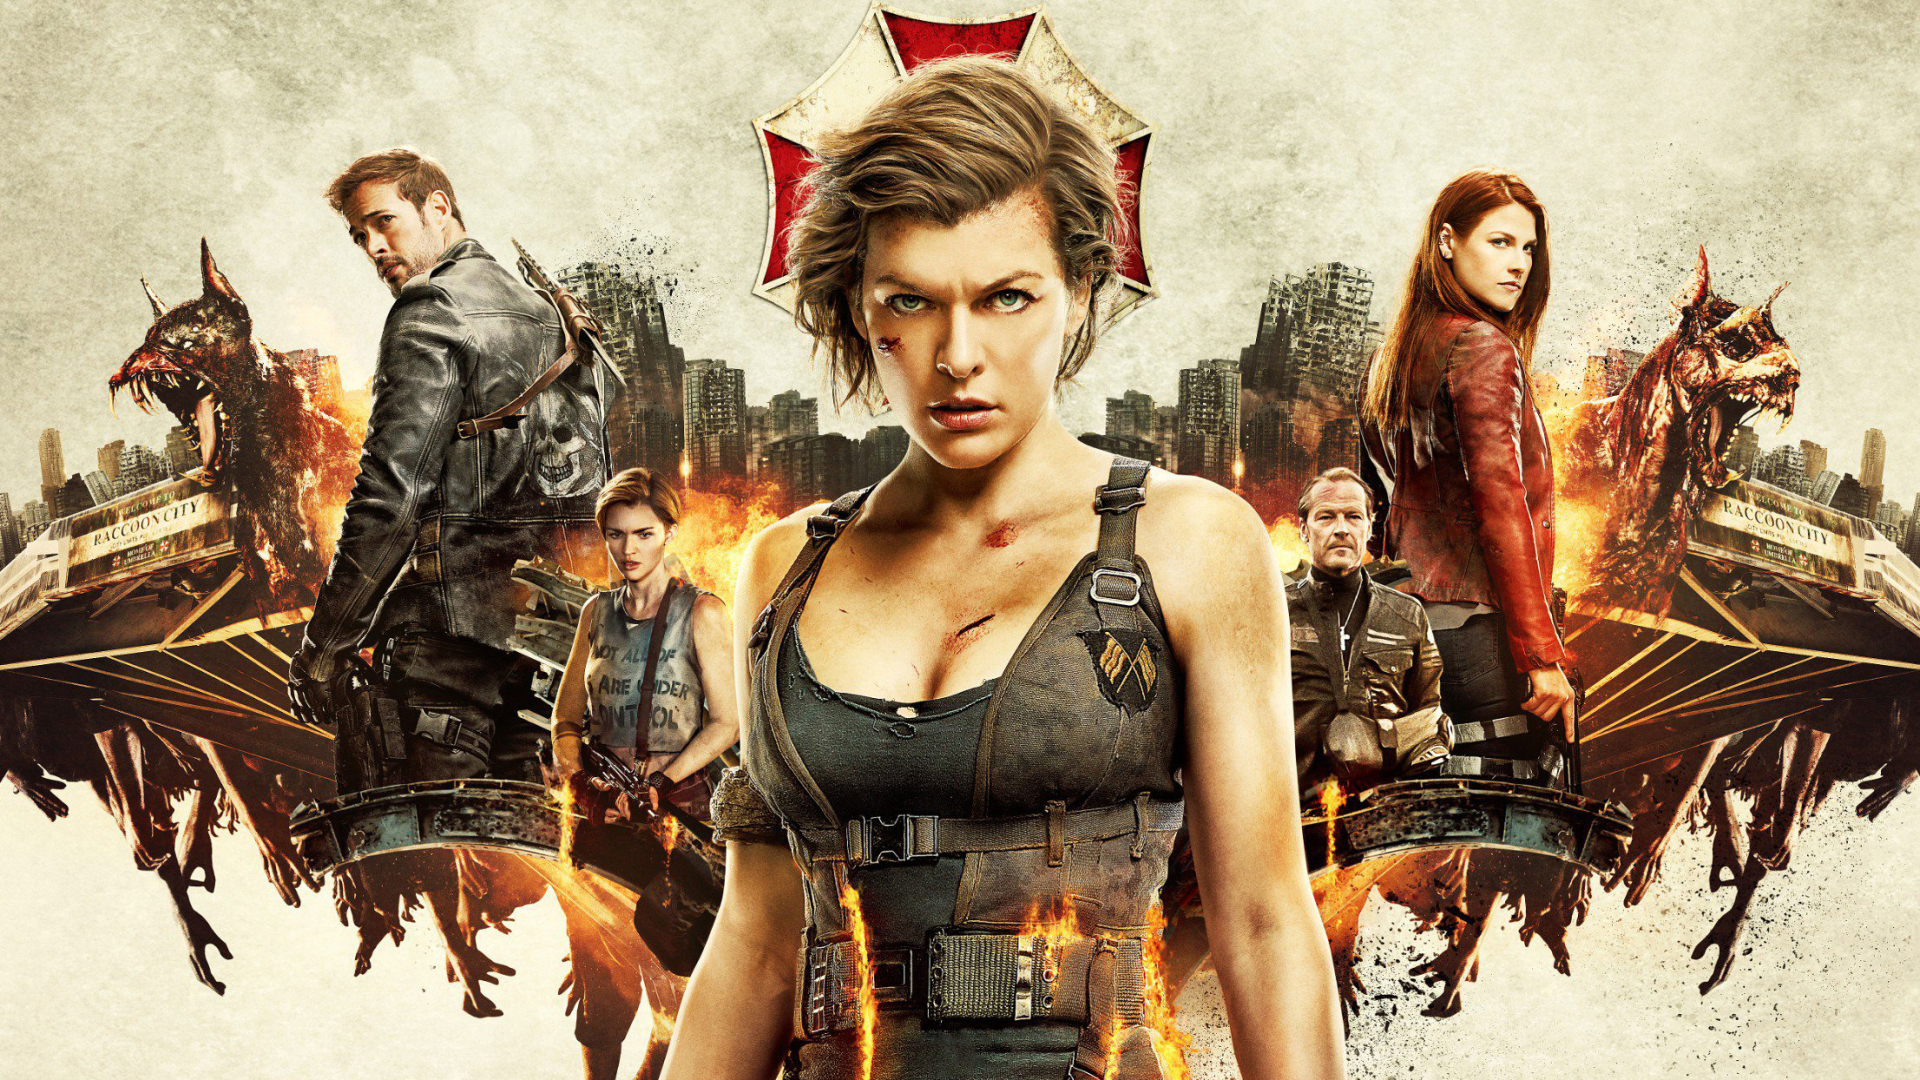 Fondos De Pantalla De Resident Evil The Final Chapter